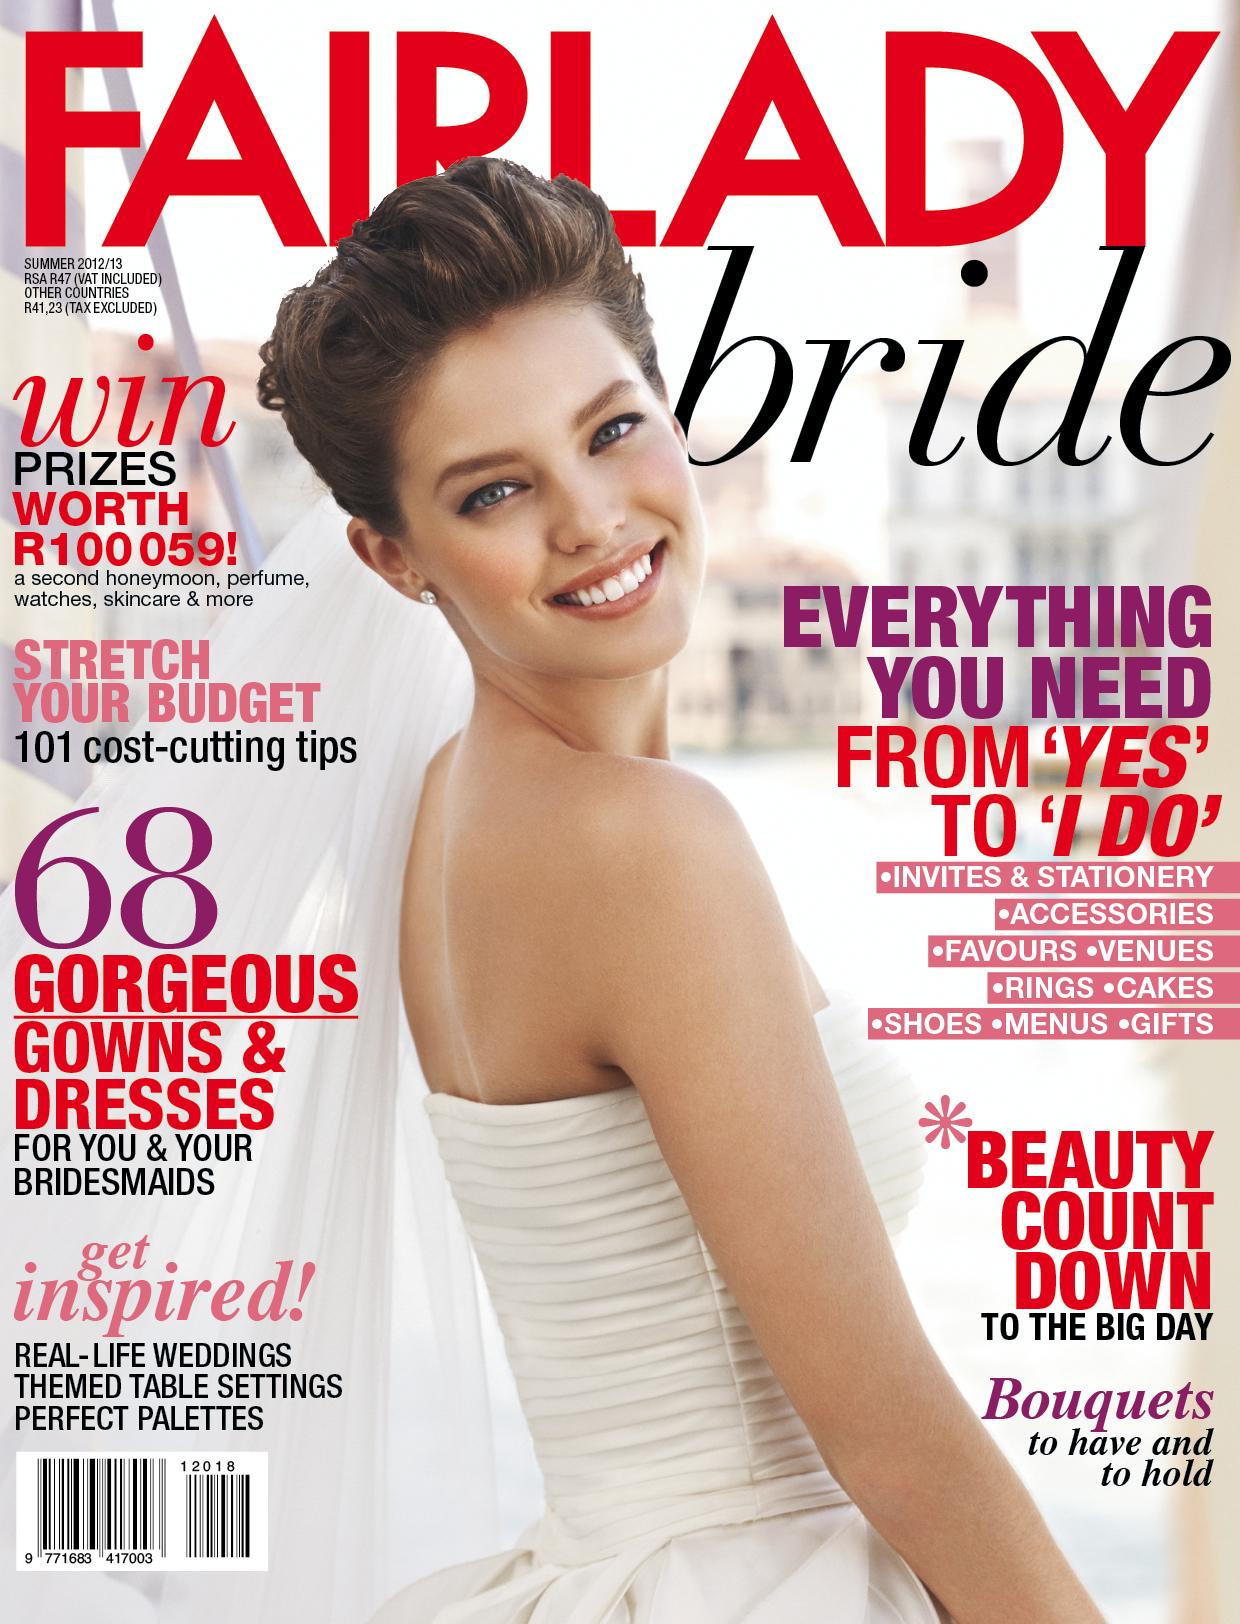 Fly bride cover.jpg